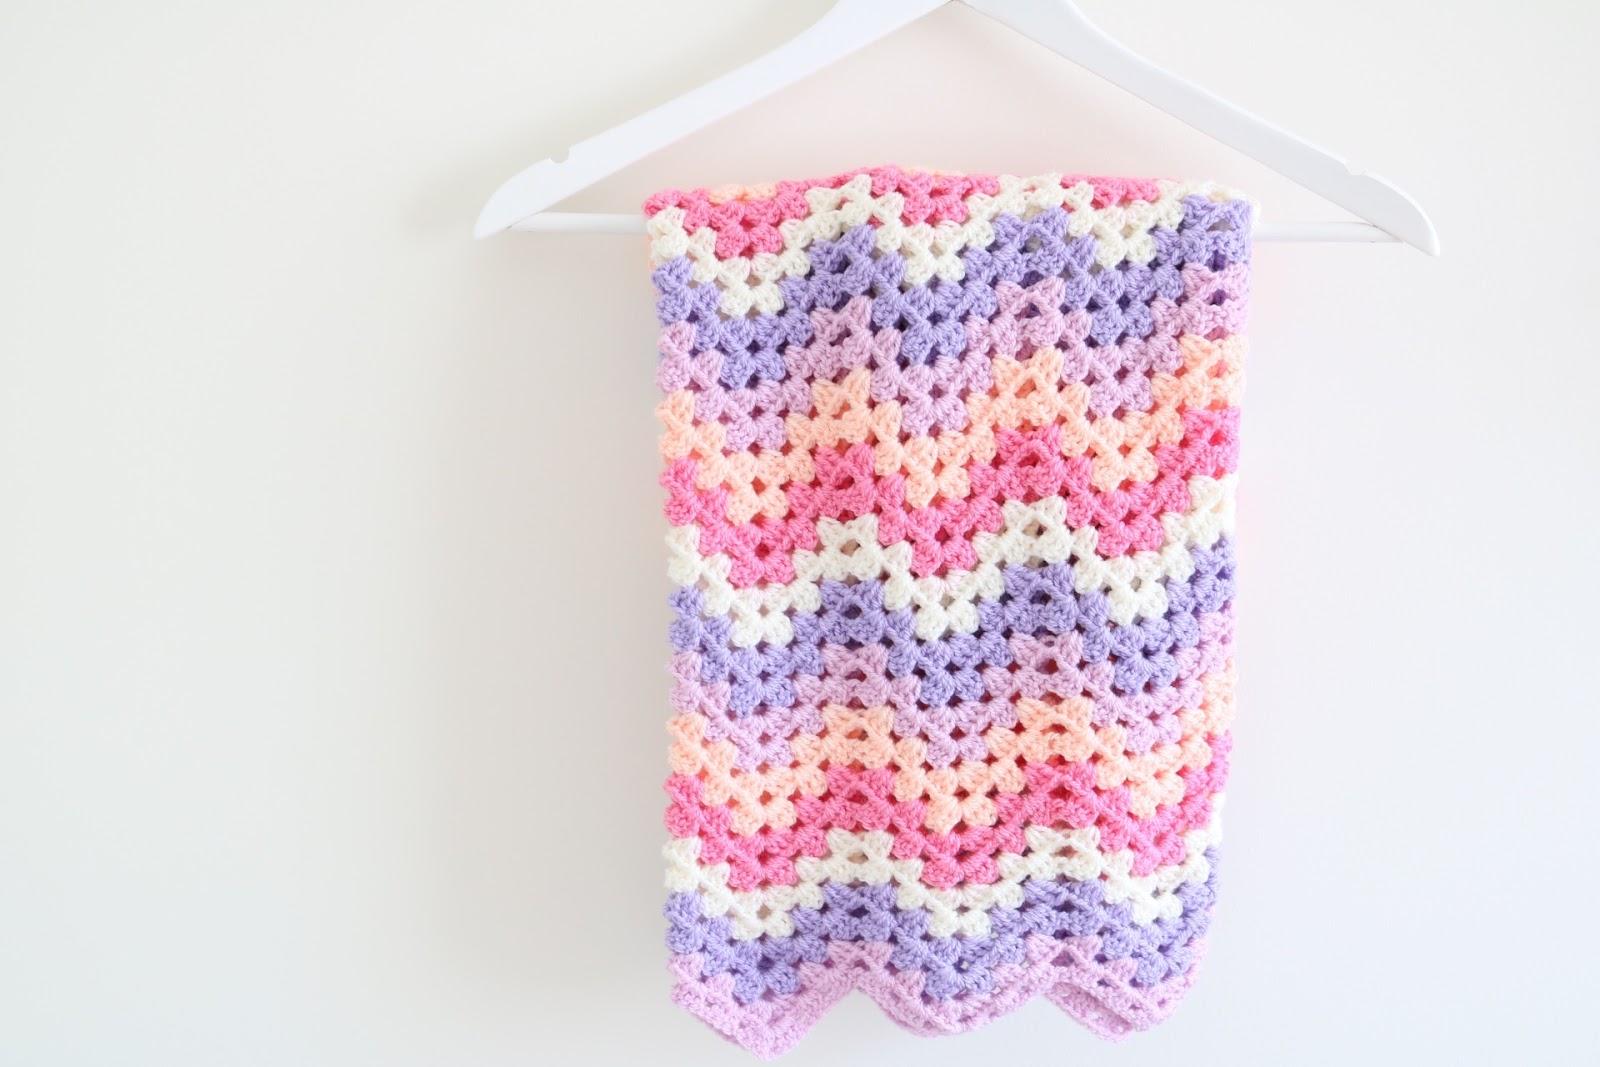 Crochet Granny Chevron Blanket Tutorial Bella Coco By Sarah Jayne